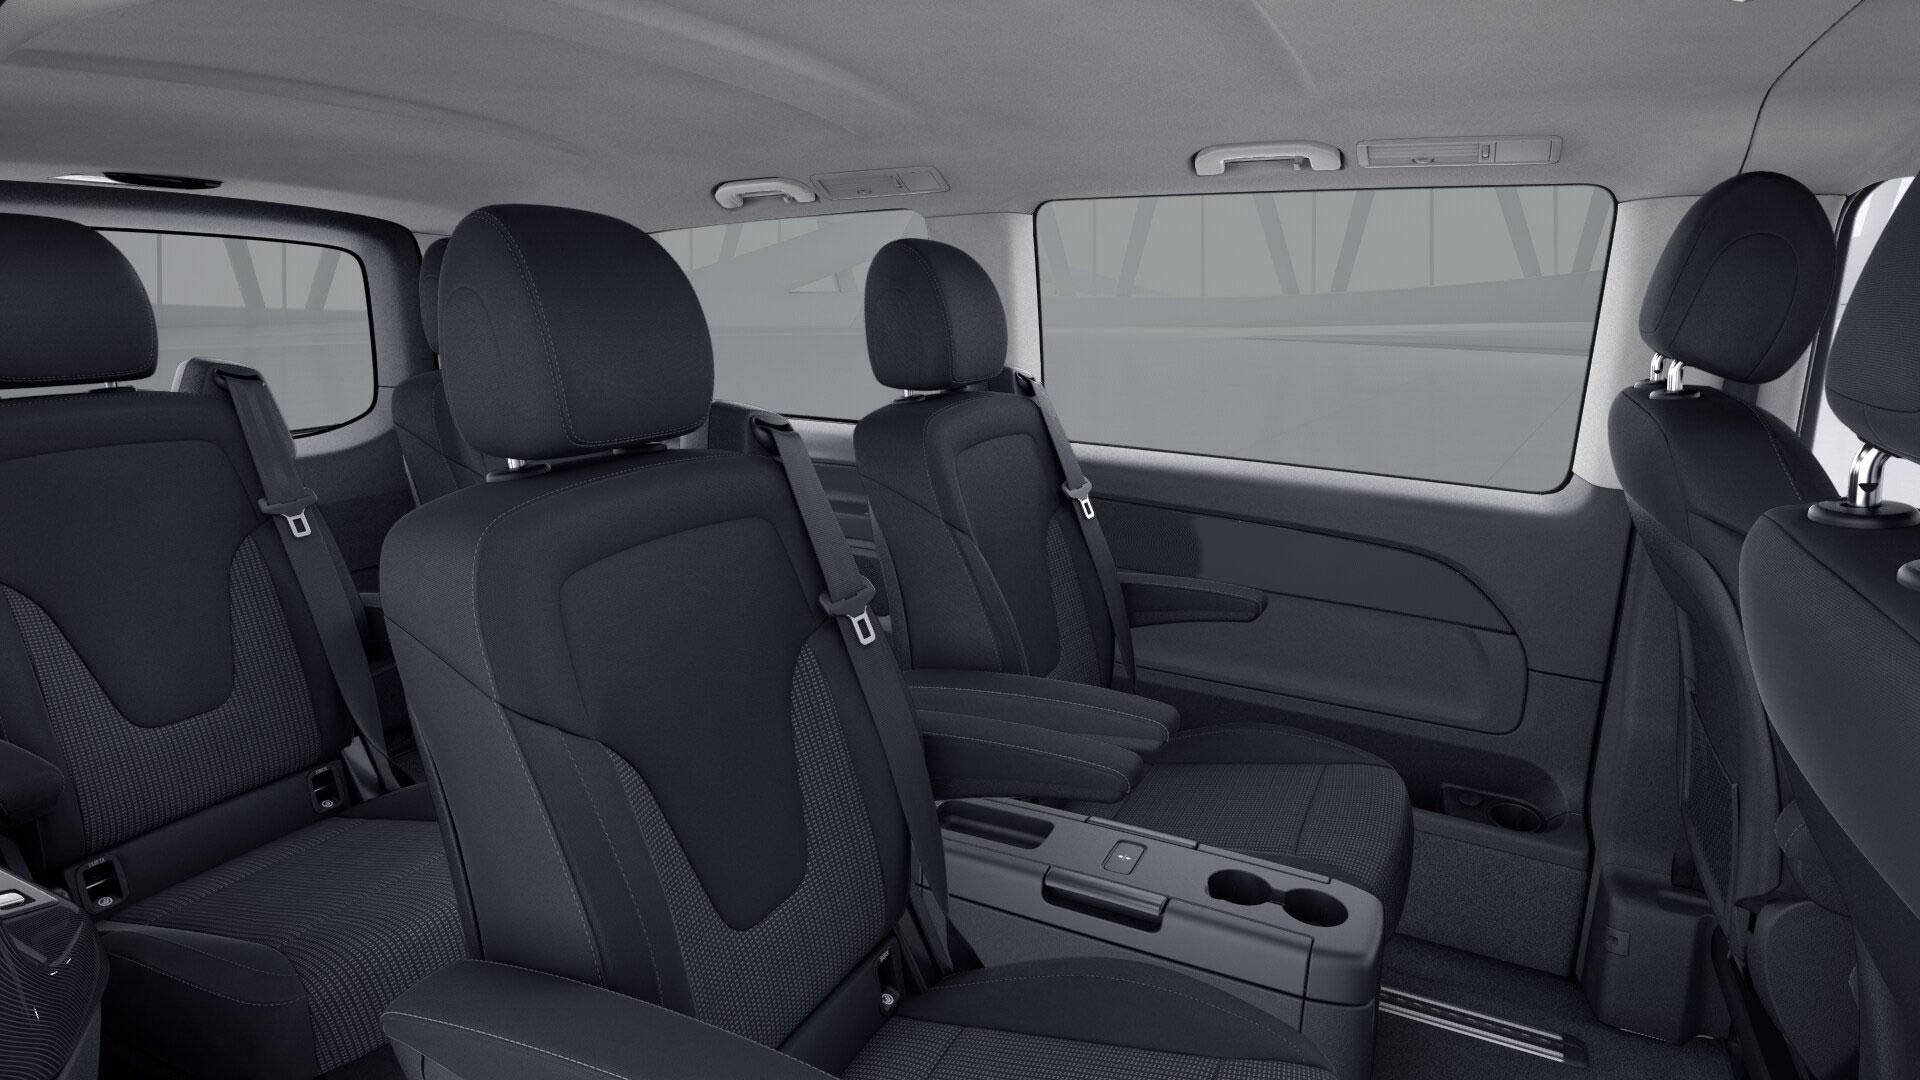 Mercedes V Class 250d 4Motion interior